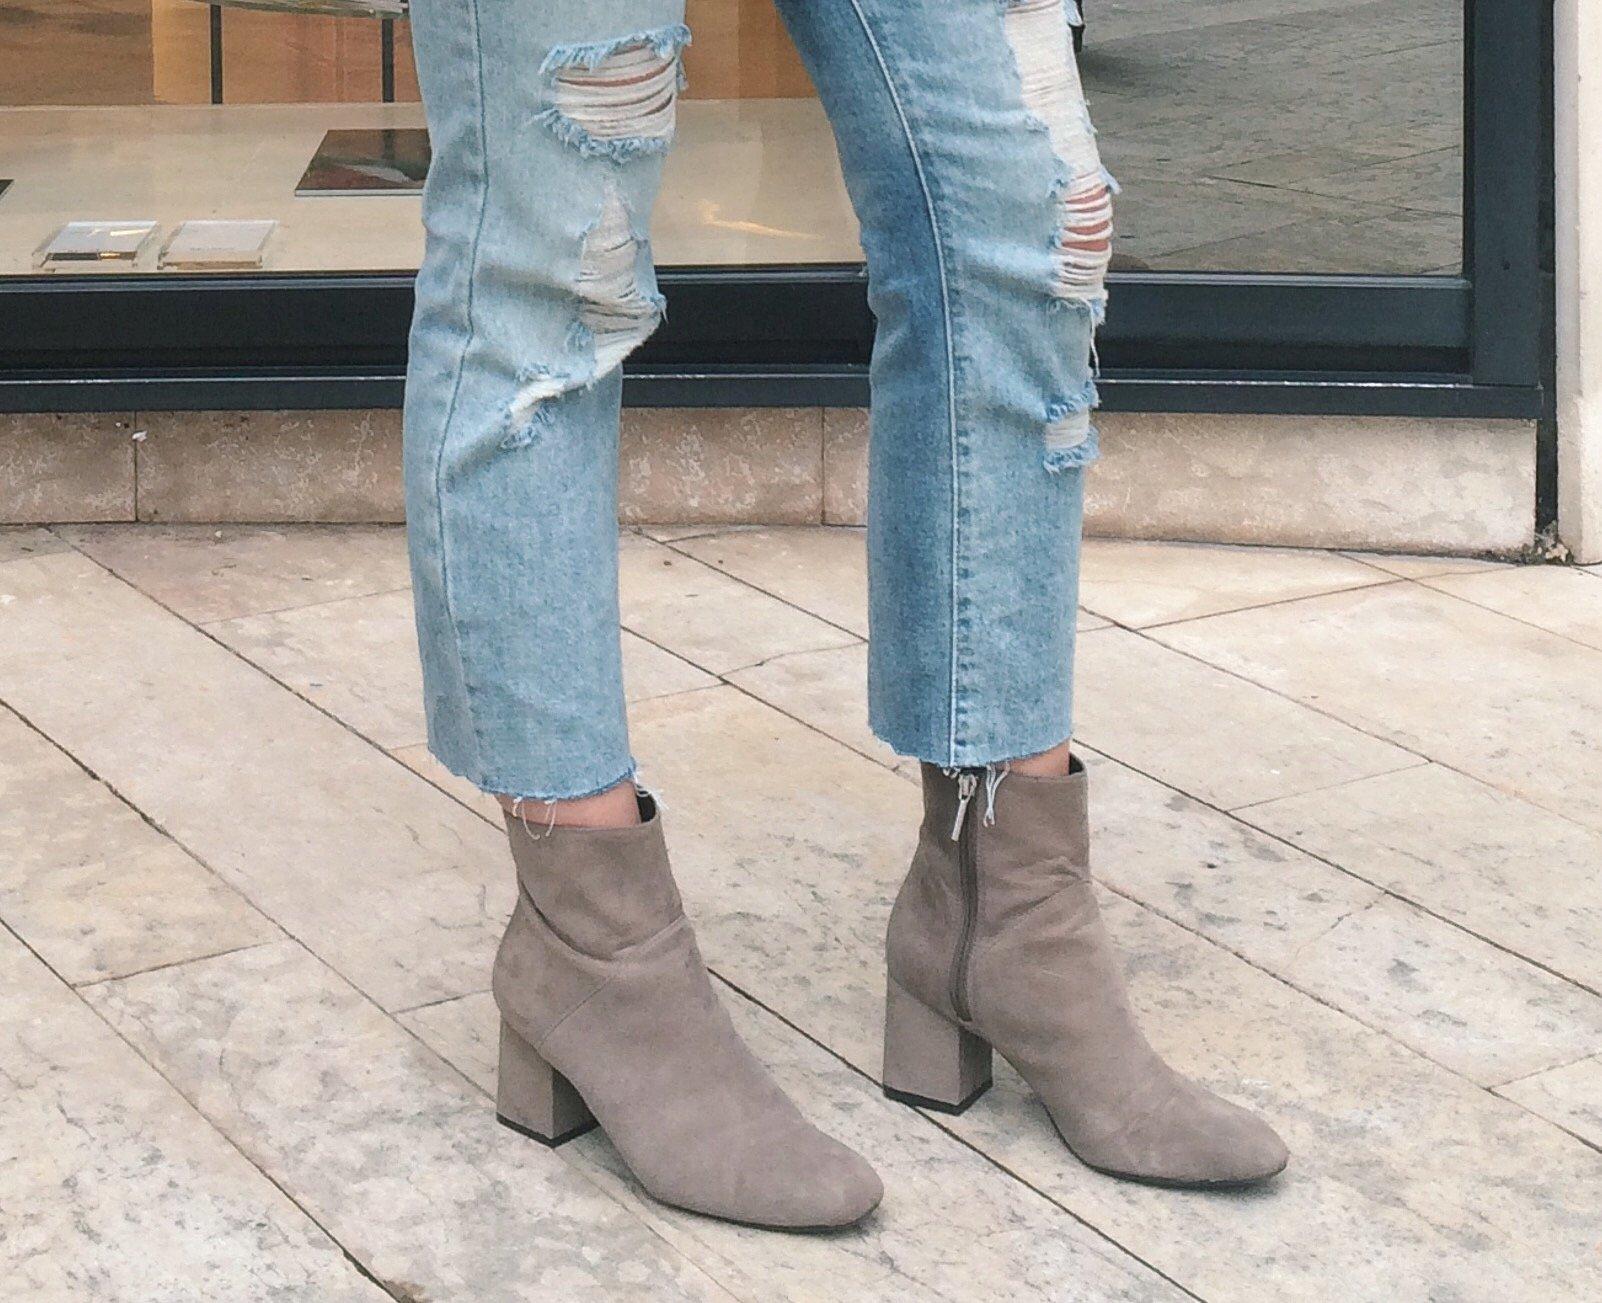 Boyfriend coupé : Forever 21 Ankle boots : Zara